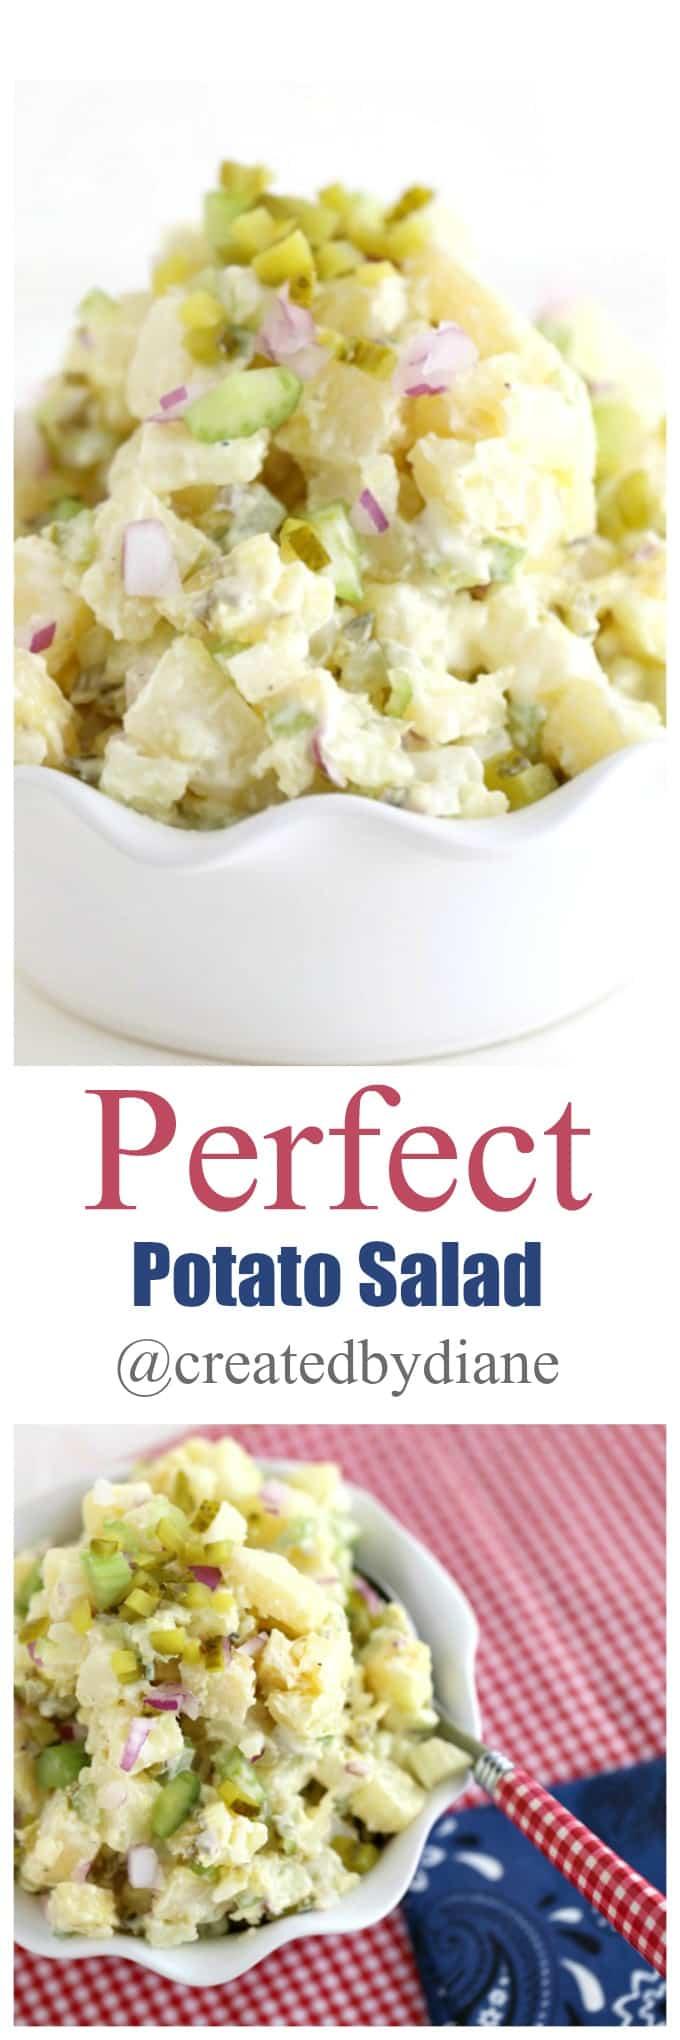 Perfect Potato Salad recipe @createdbydiane